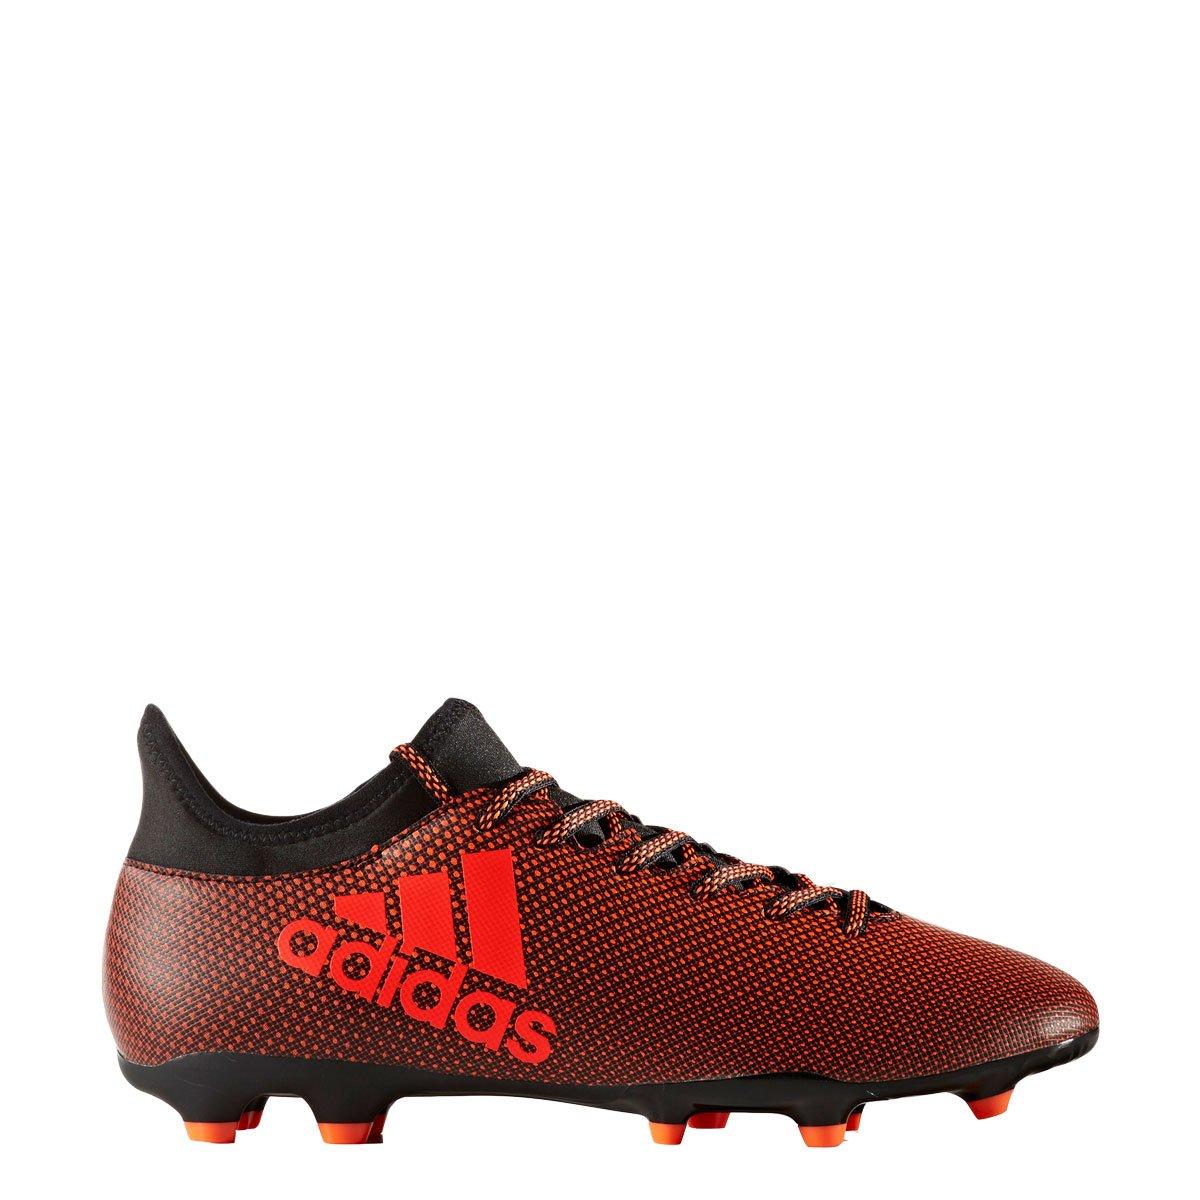 9ffe9eafb9 Bizz Store - Chuteira Futebol De Campo Masculina Adidas X 17.3 FG